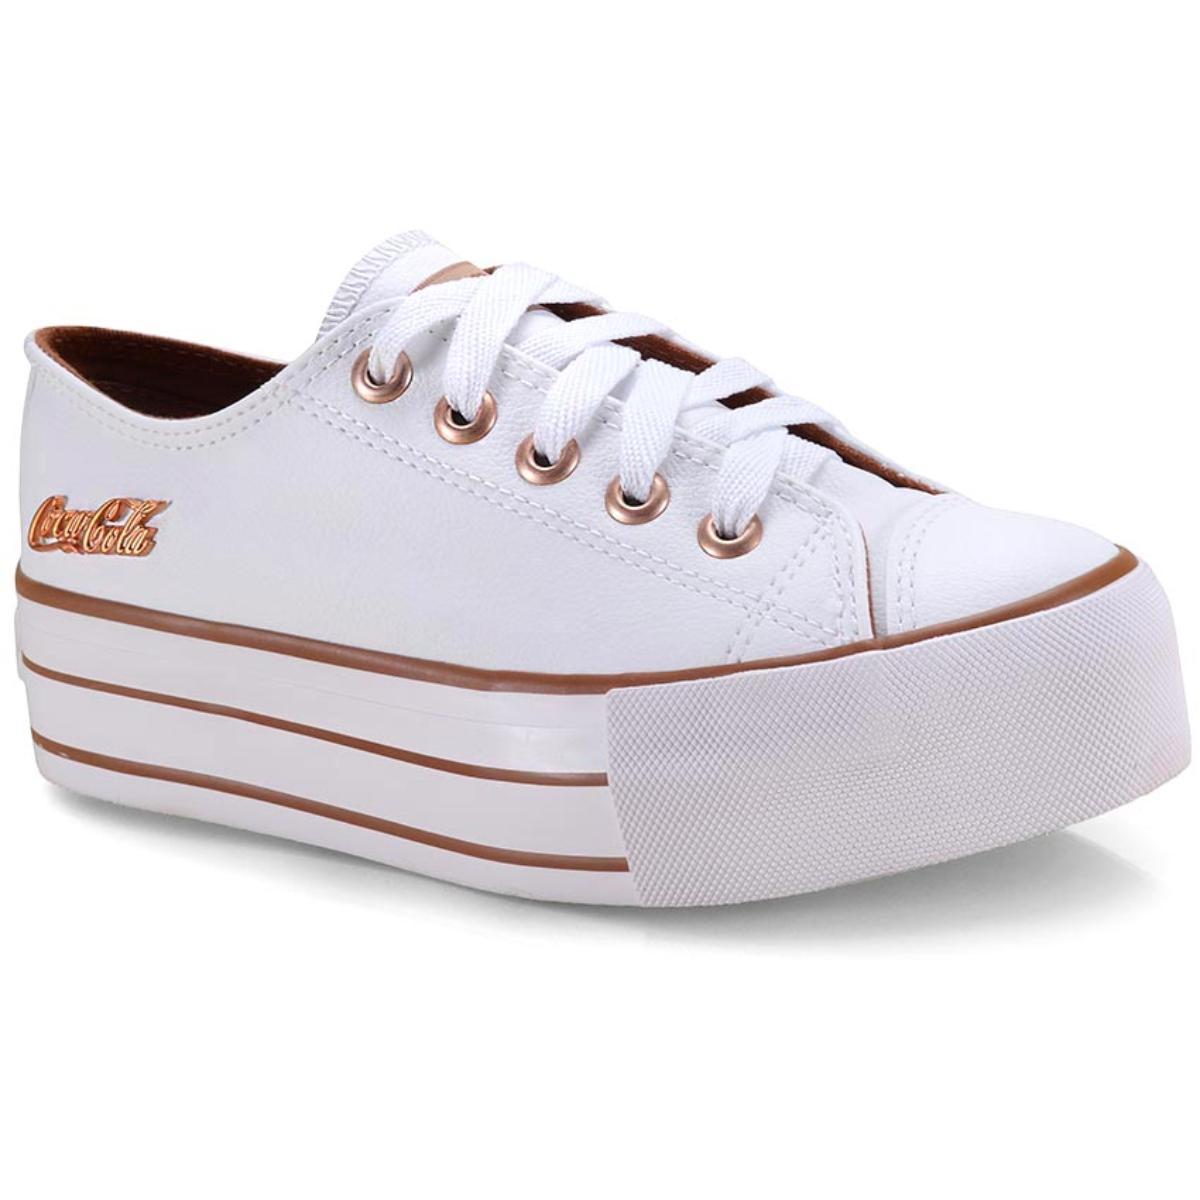 Tênis Feminino Coca-cola Shoes Cc1550 Branco